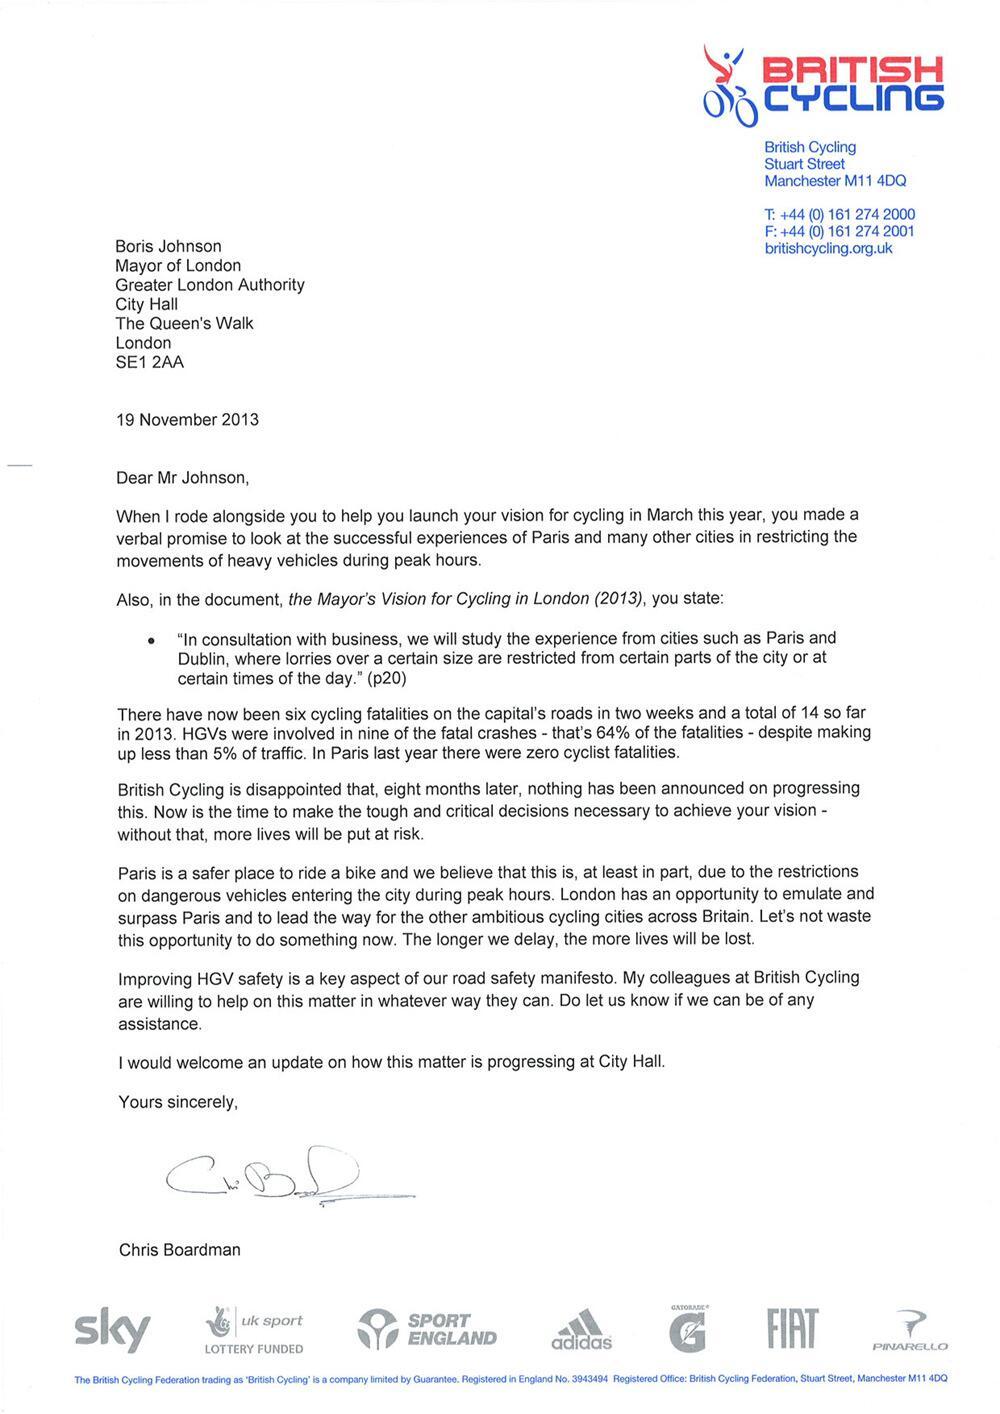 Chris Boardman appeals to Boris Johnson to improve HGV ...